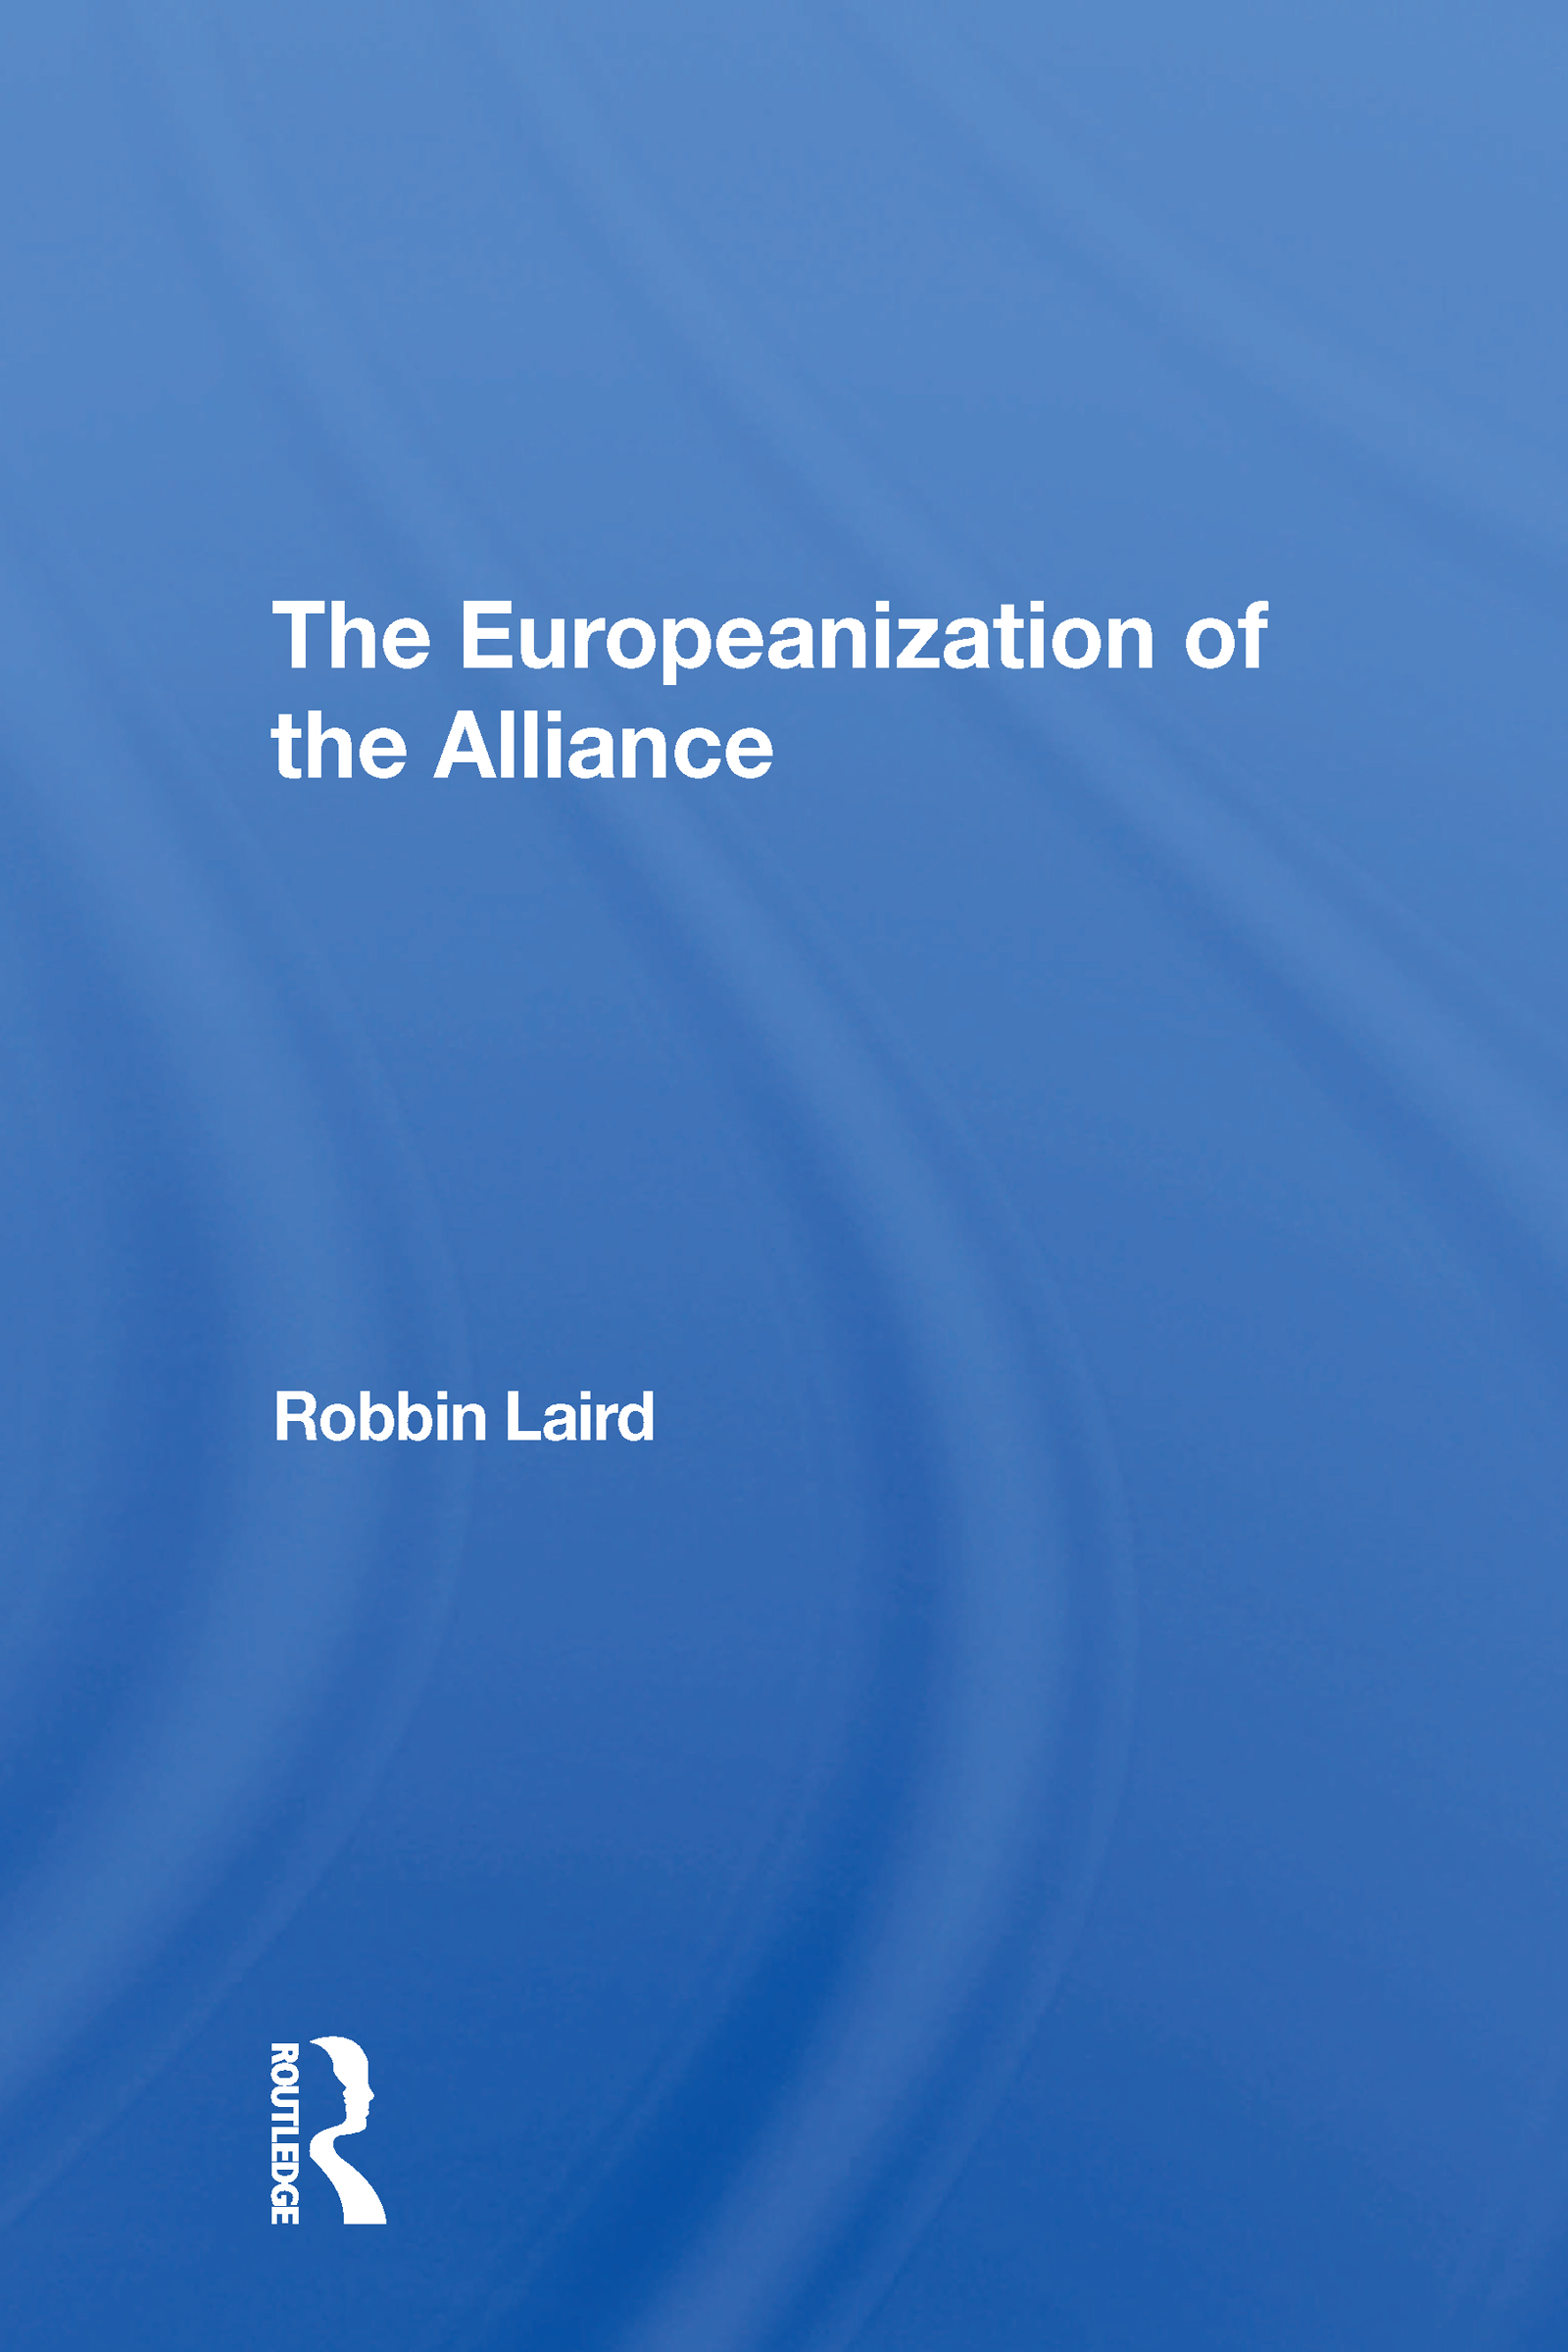 The Europeanization Of The Alliance